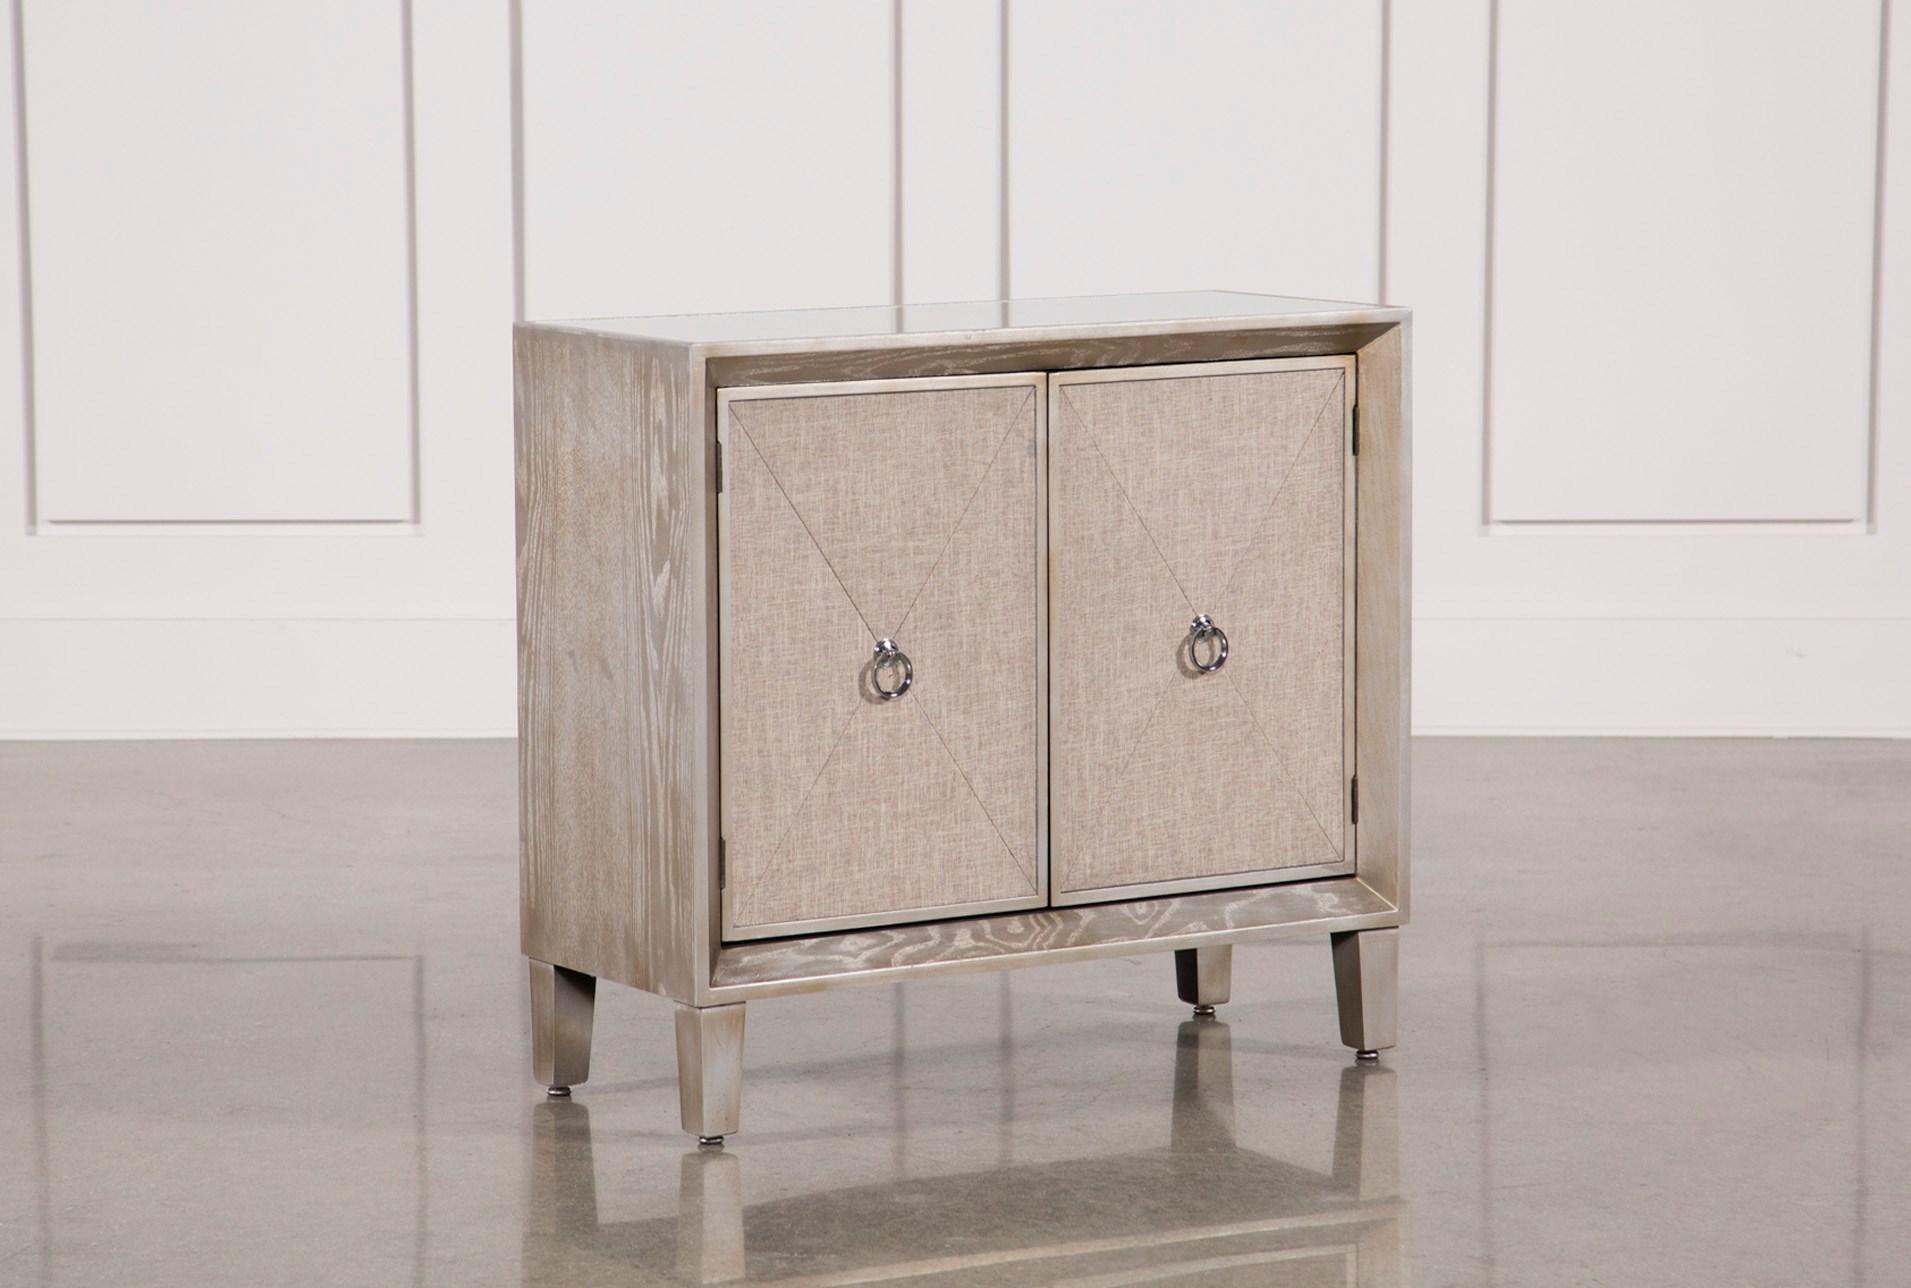 p lh cabinet chelsea ftg lrg drawer tall door bathroom